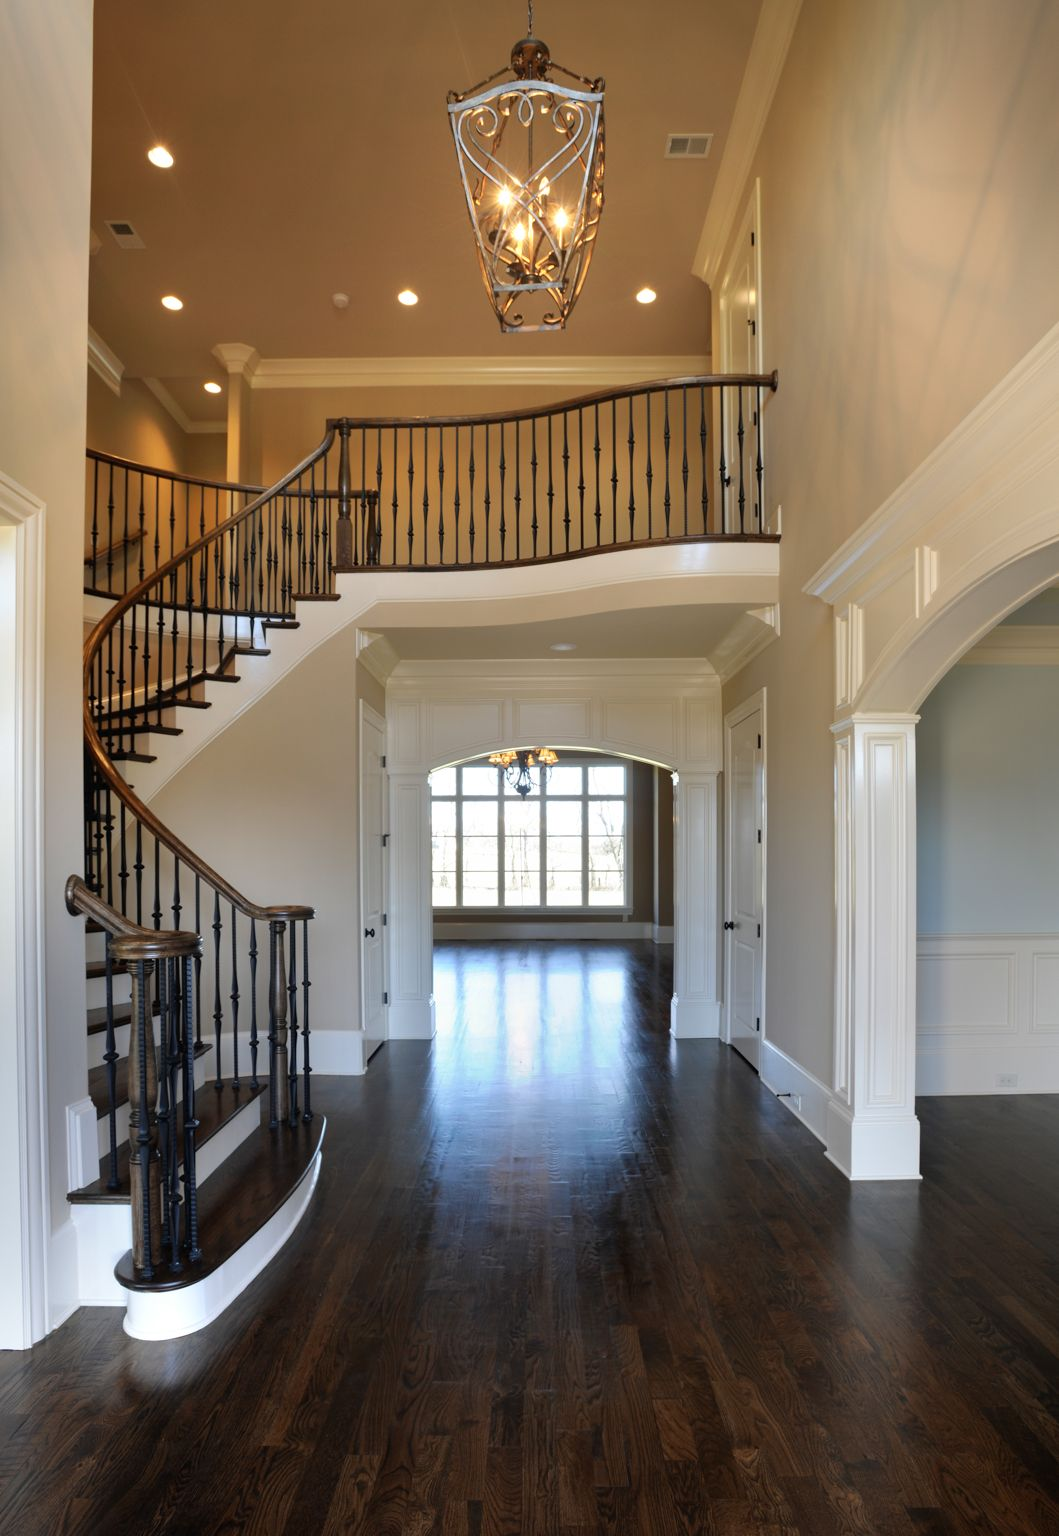 Best Beautiful Foyer Foyer Design Dream House Interior Foyer Staircase 640 x 480